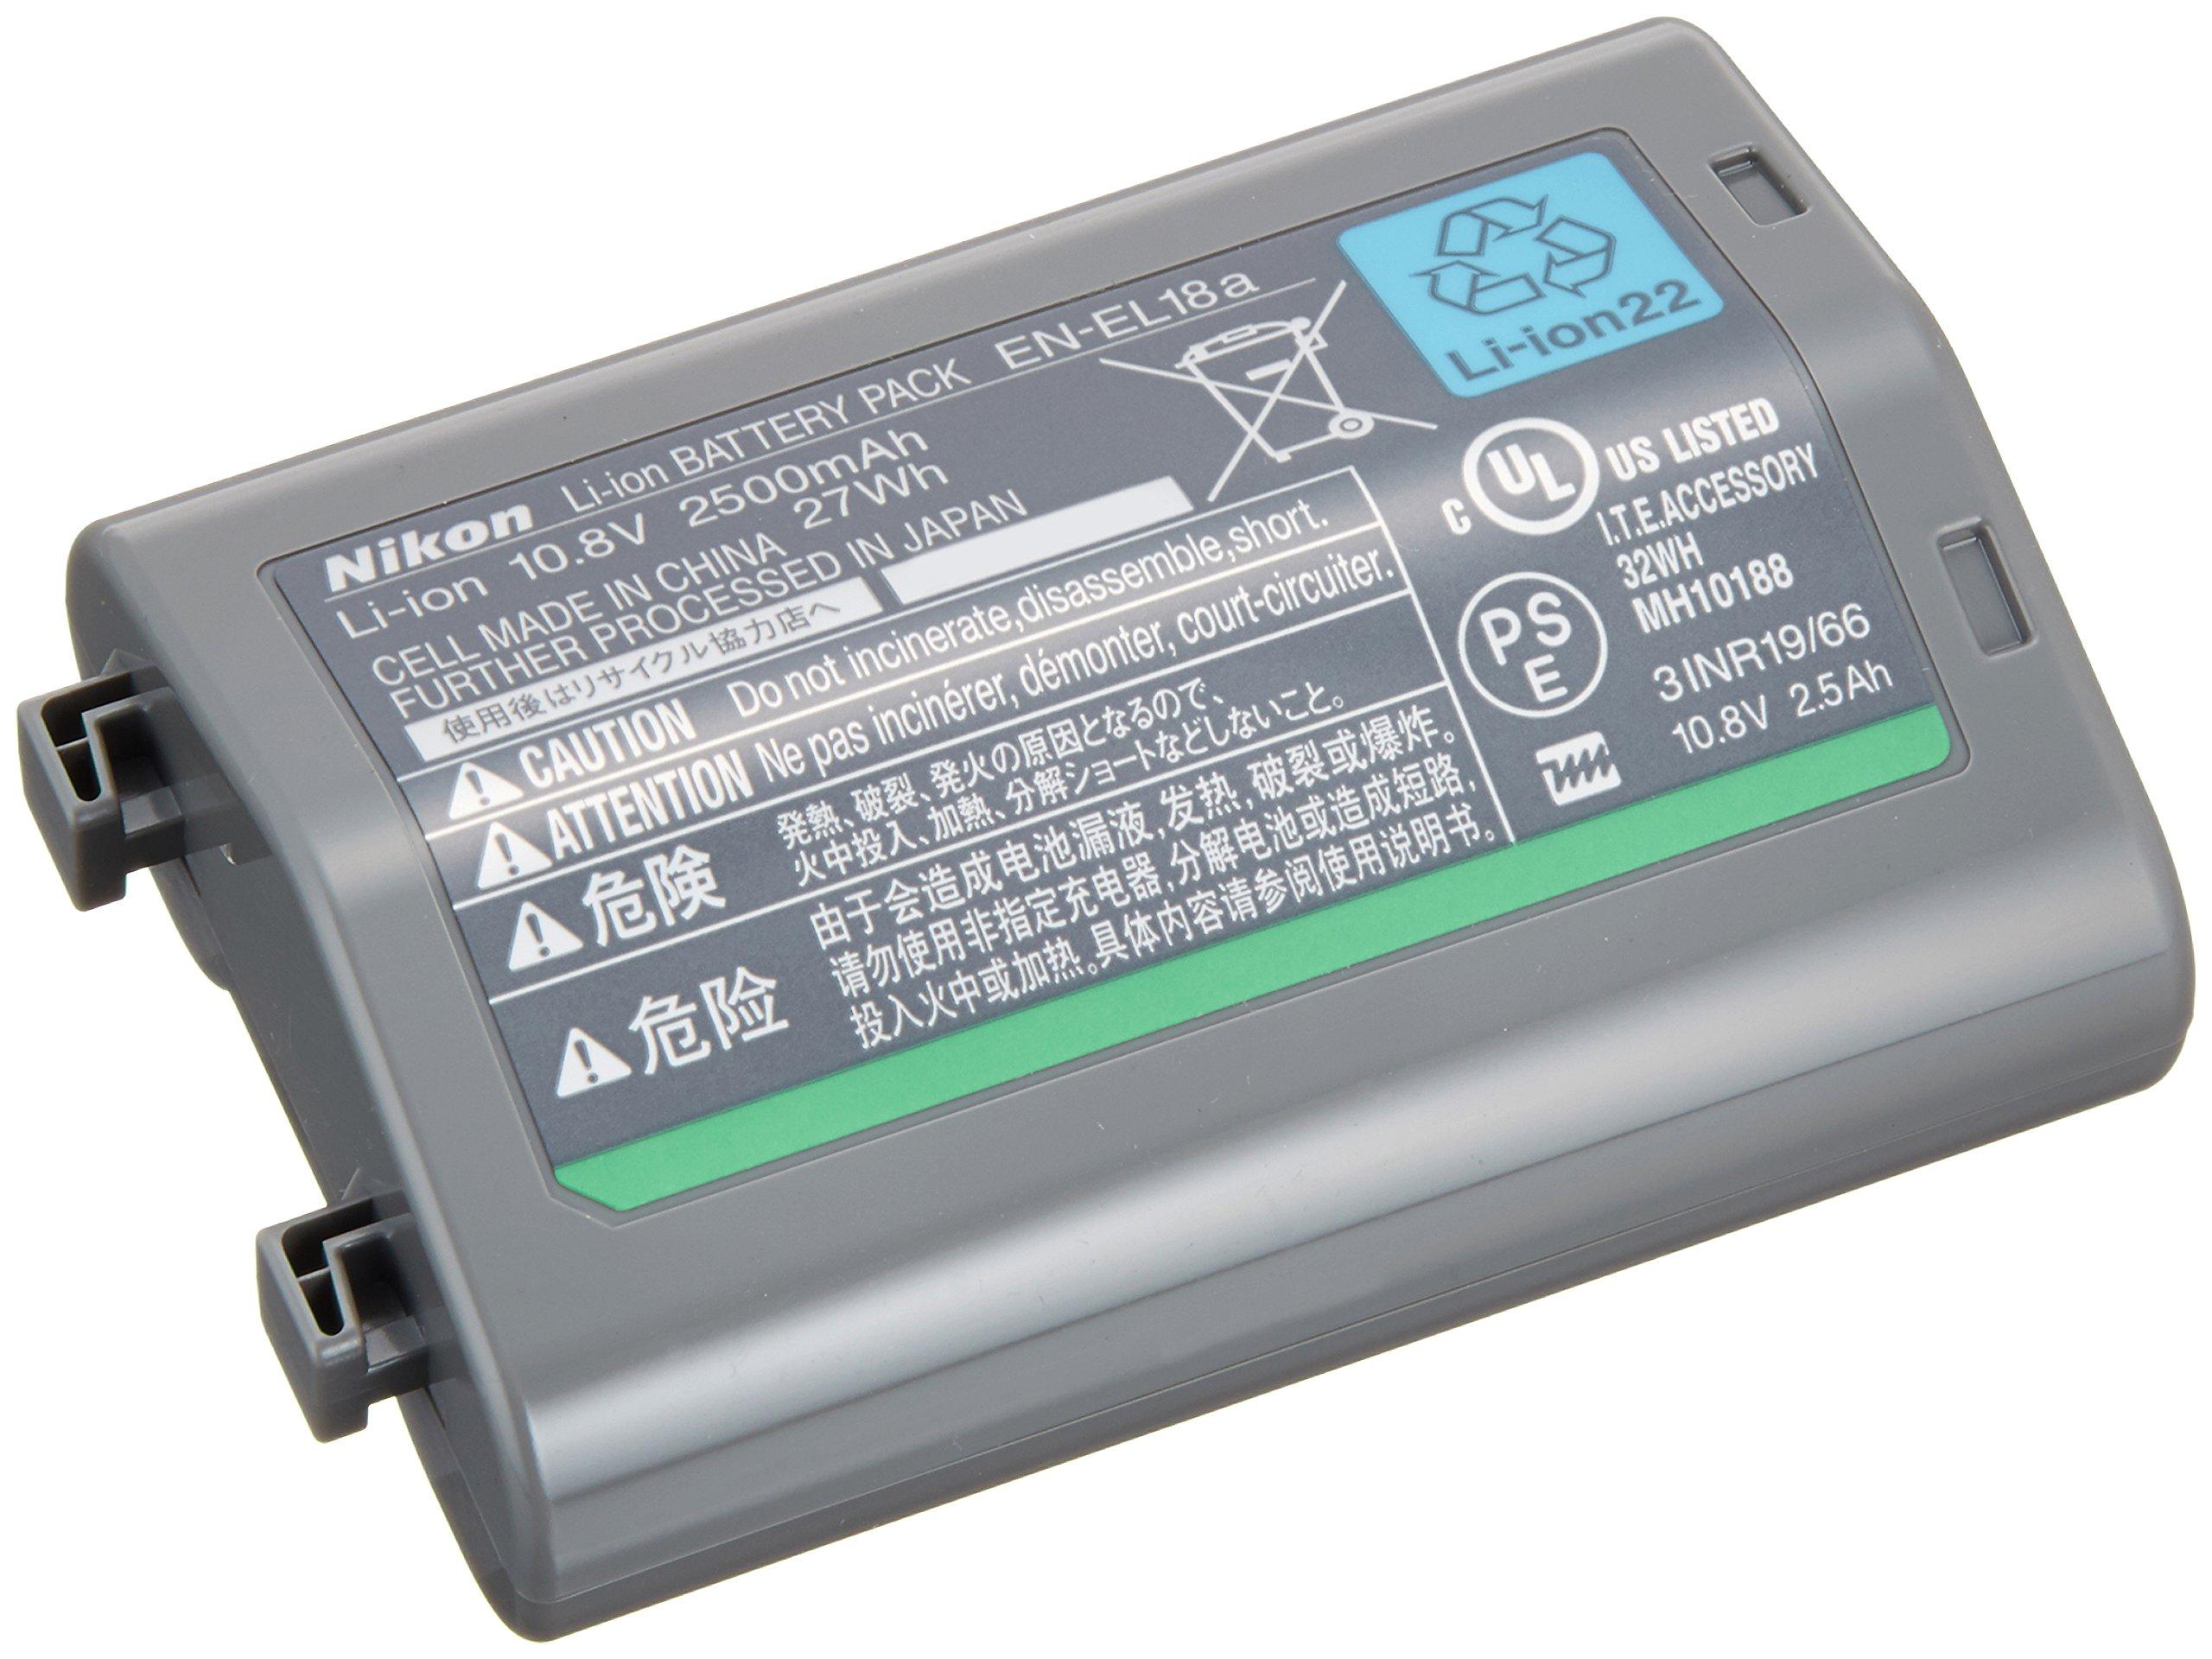 Nikon Li-ion rechargeable battery EN-EL18a